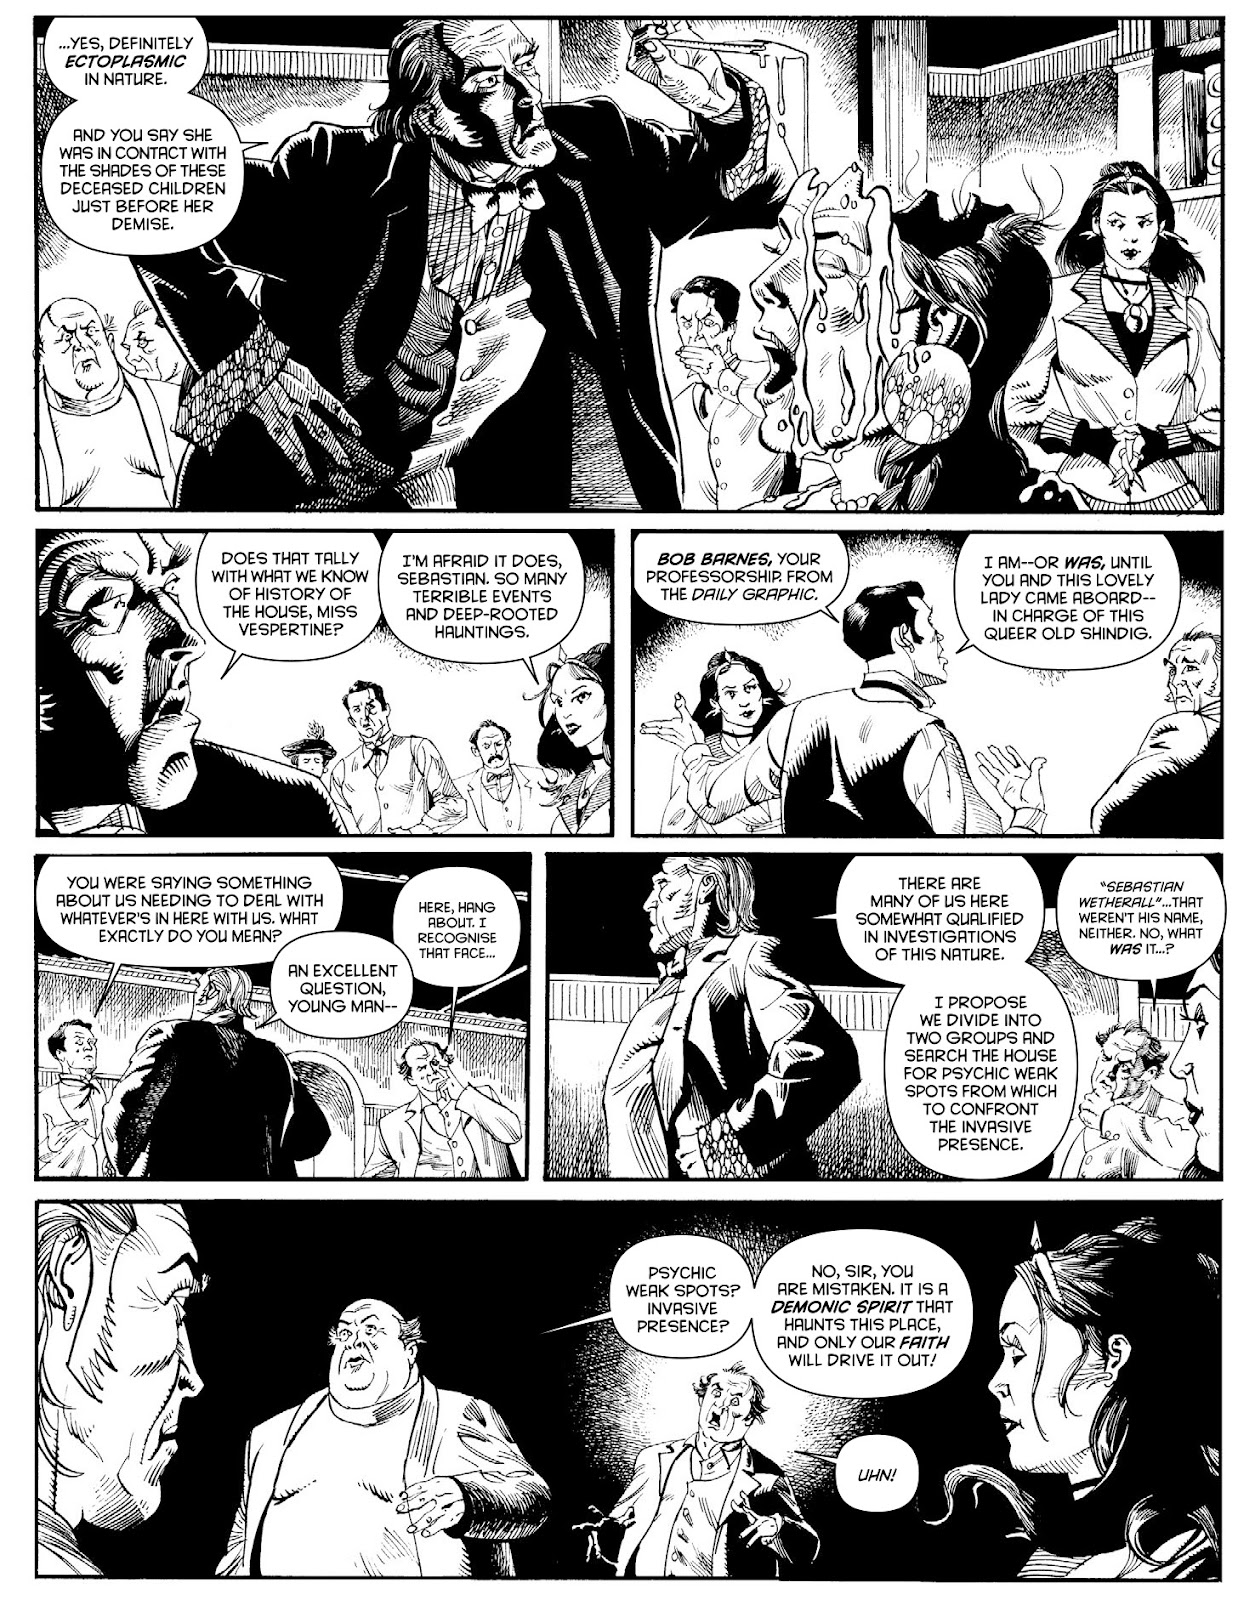 Judge Dredd Megazine (Vol. 5) issue 427 - Page 86